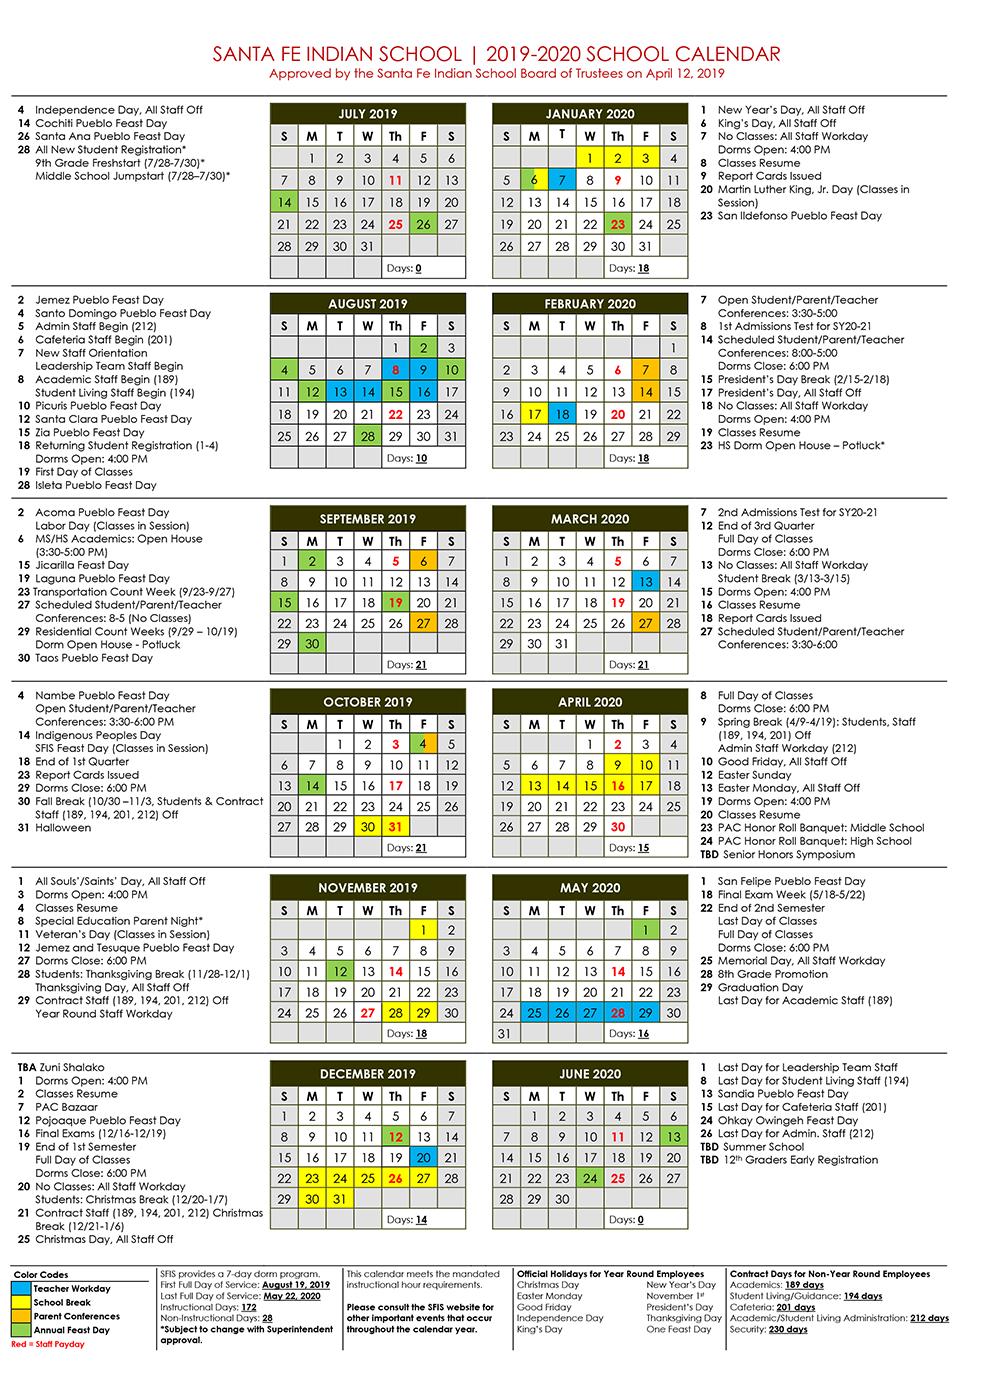 Unm Academic Calendar Fall 2020.Academic Calendar Santa Fe Indian School